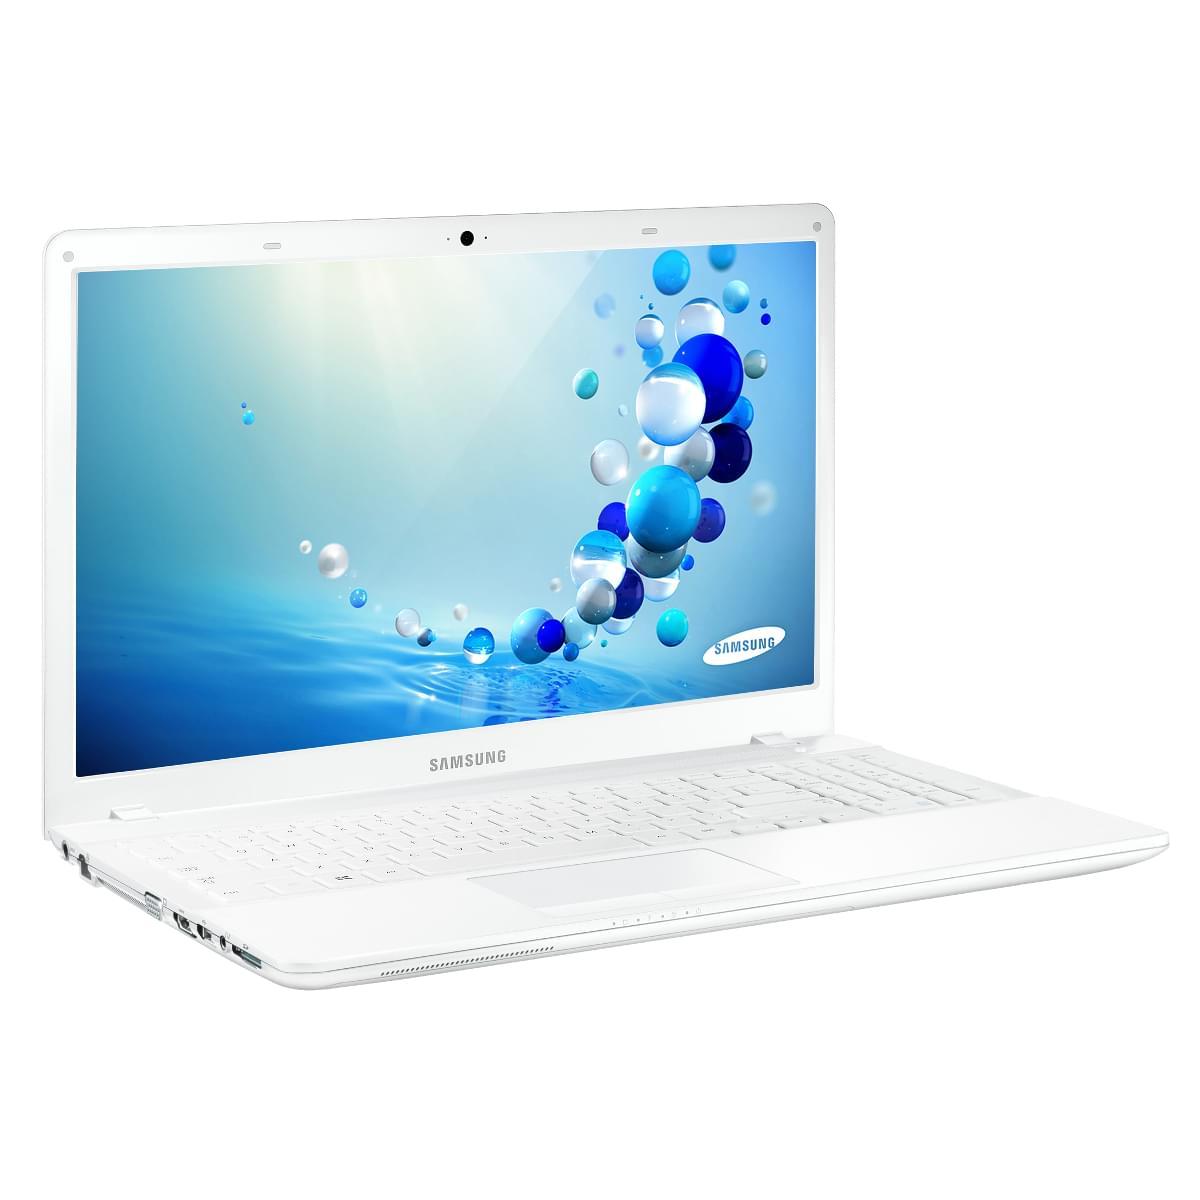 Samsung NP270E5G-K07FR (NP270E5G-K07FR) - Achat / Vente PC Portable sur Cybertek.fr - 0